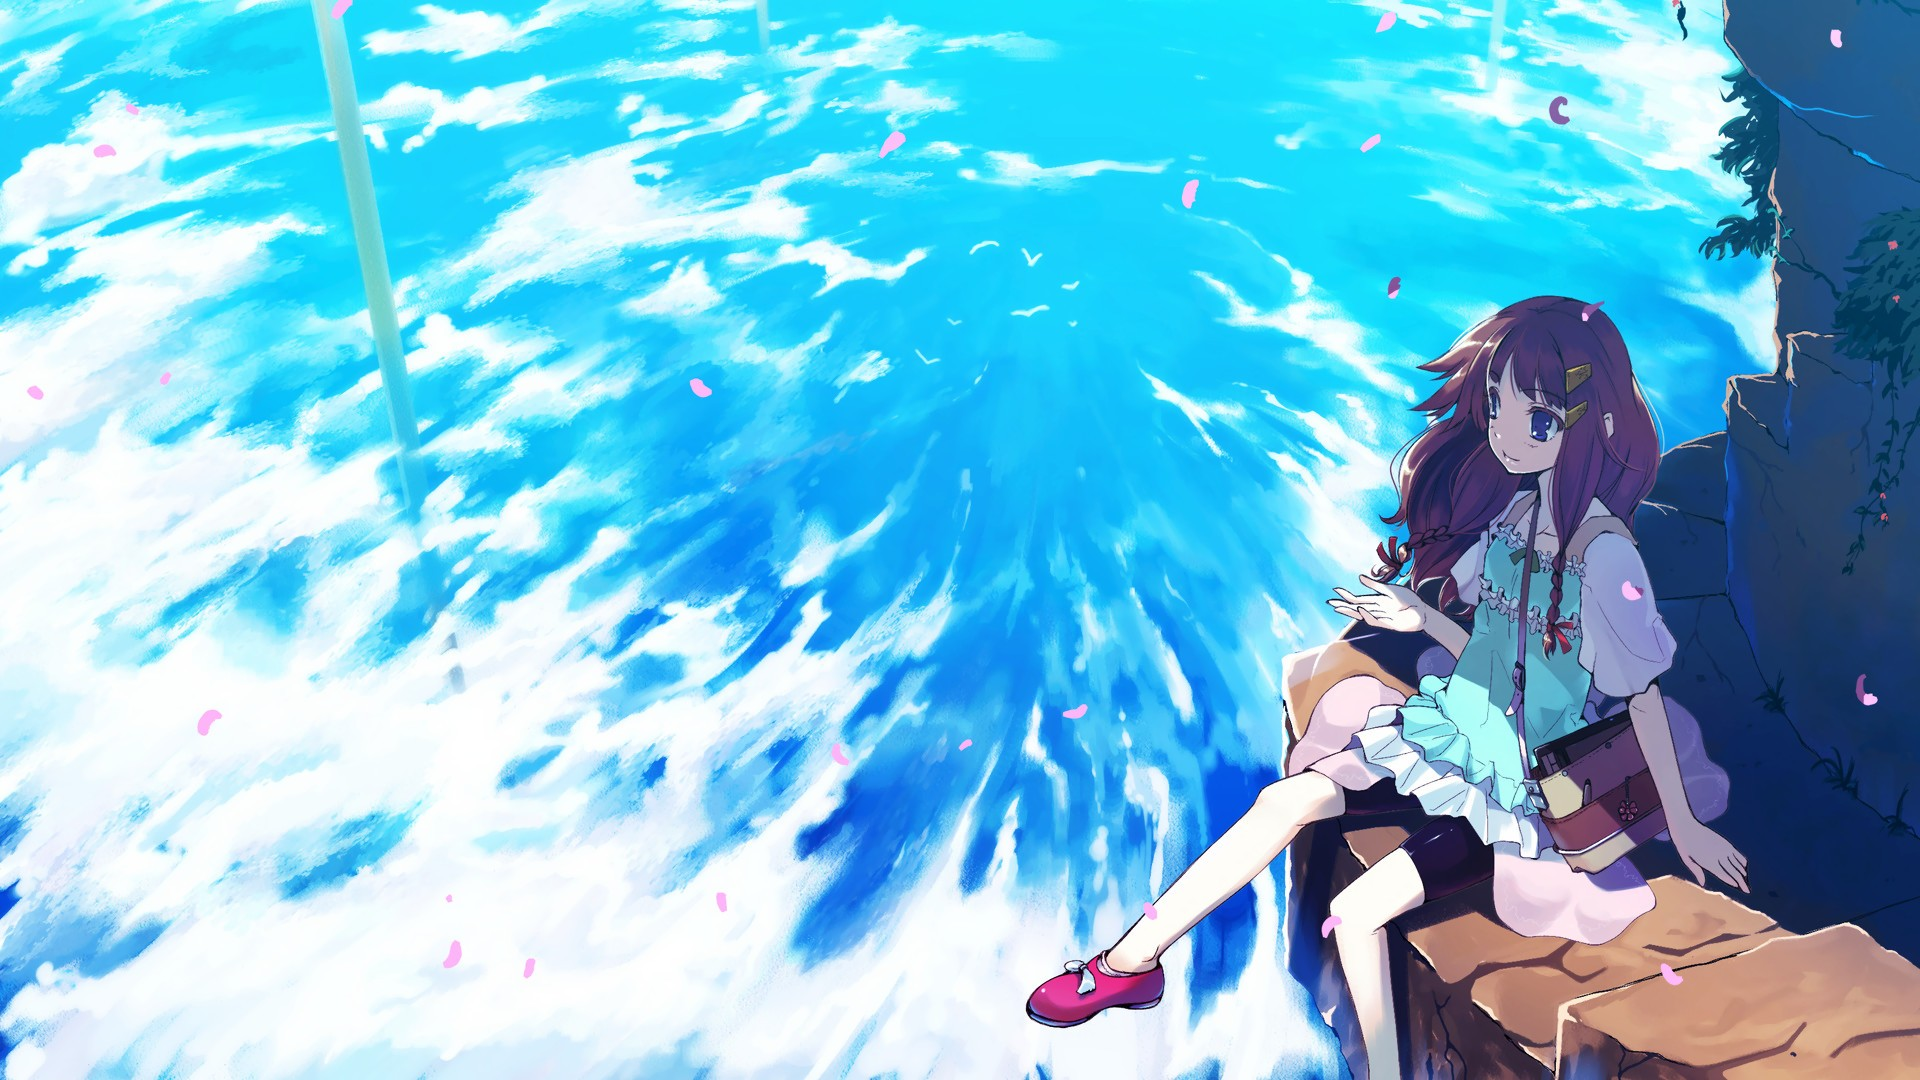 Hd Anime Wallpaper Download Free Full Hd Backgrounds For Desktop